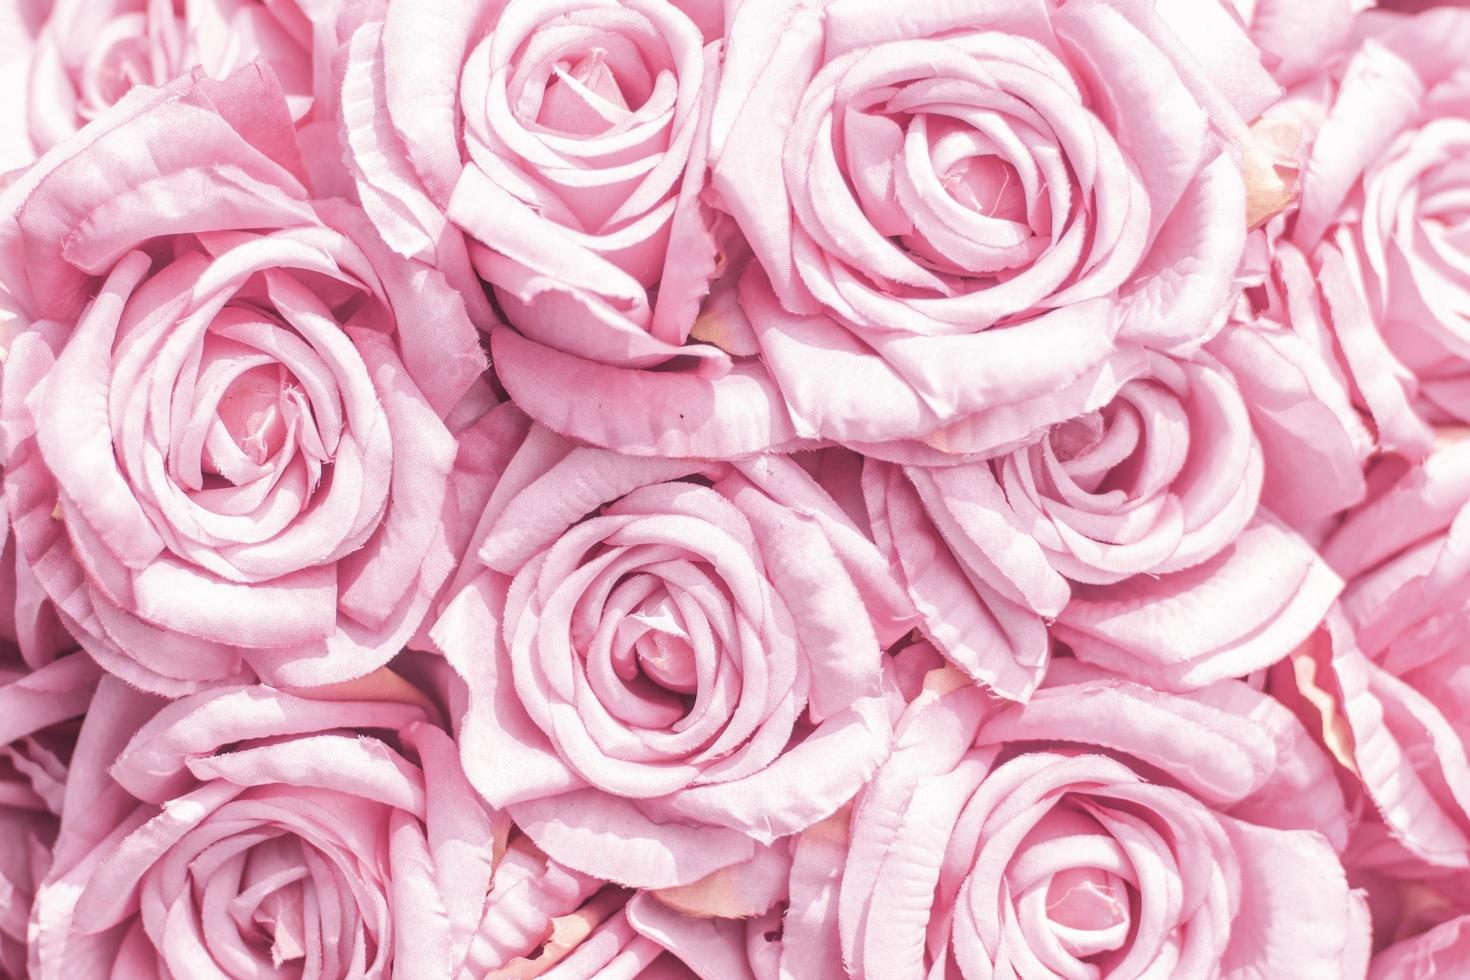 flores de tela de enfoque suave foto